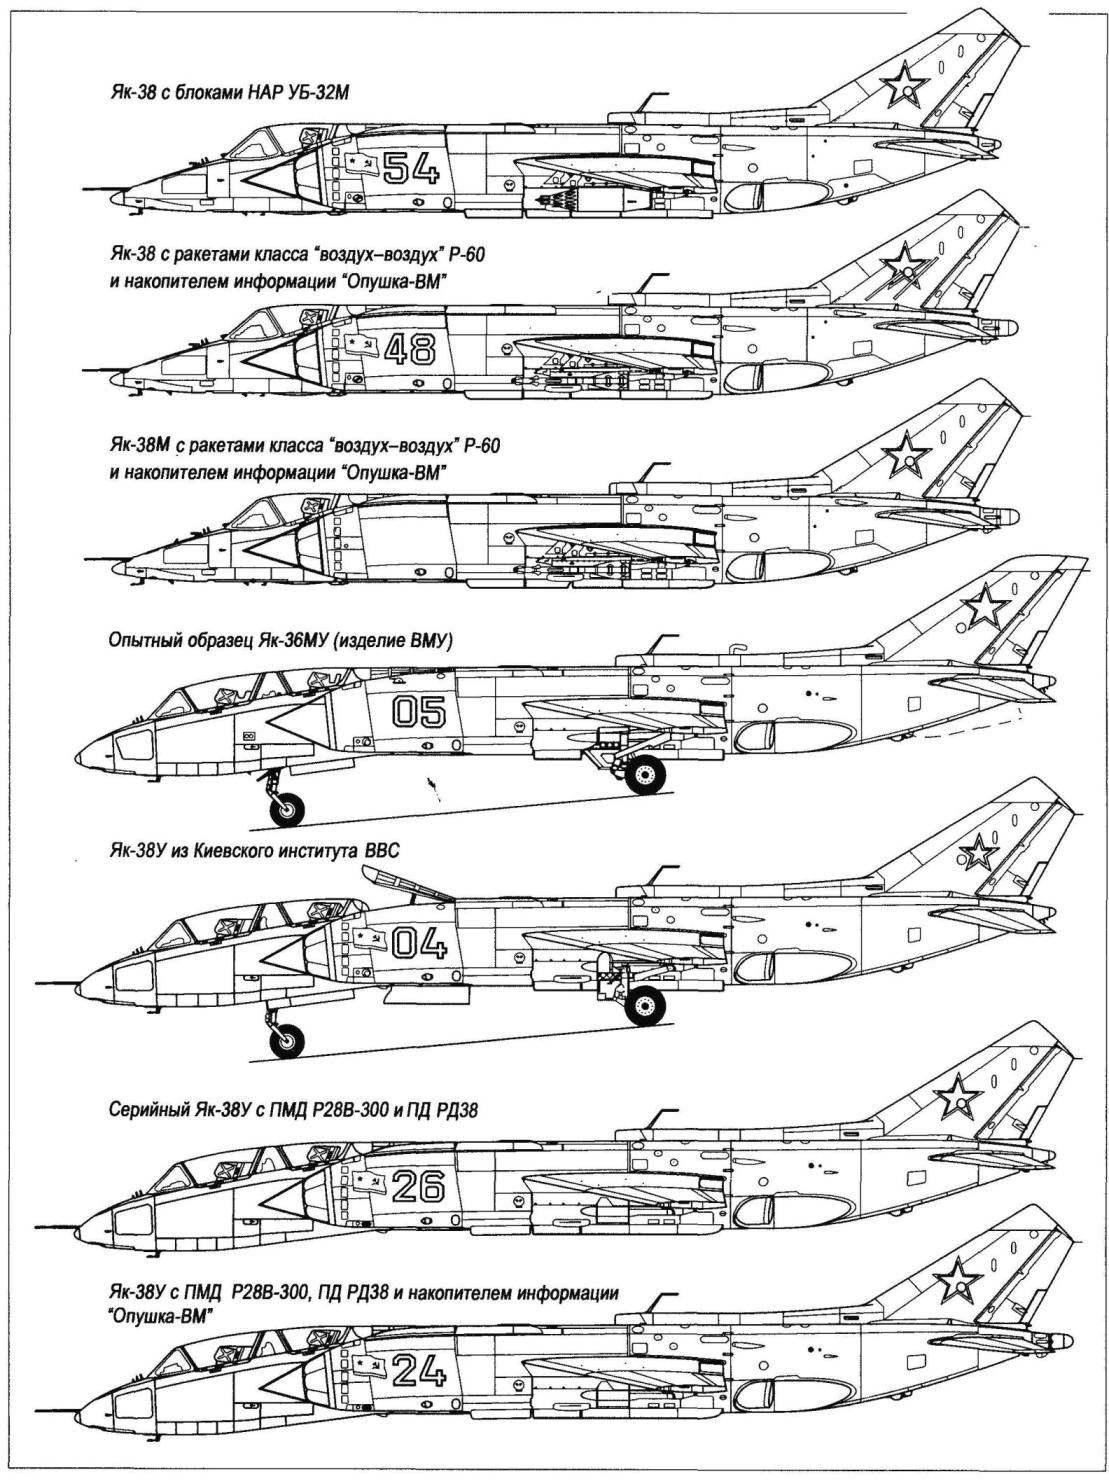 Палубный штурмовик Як-38М